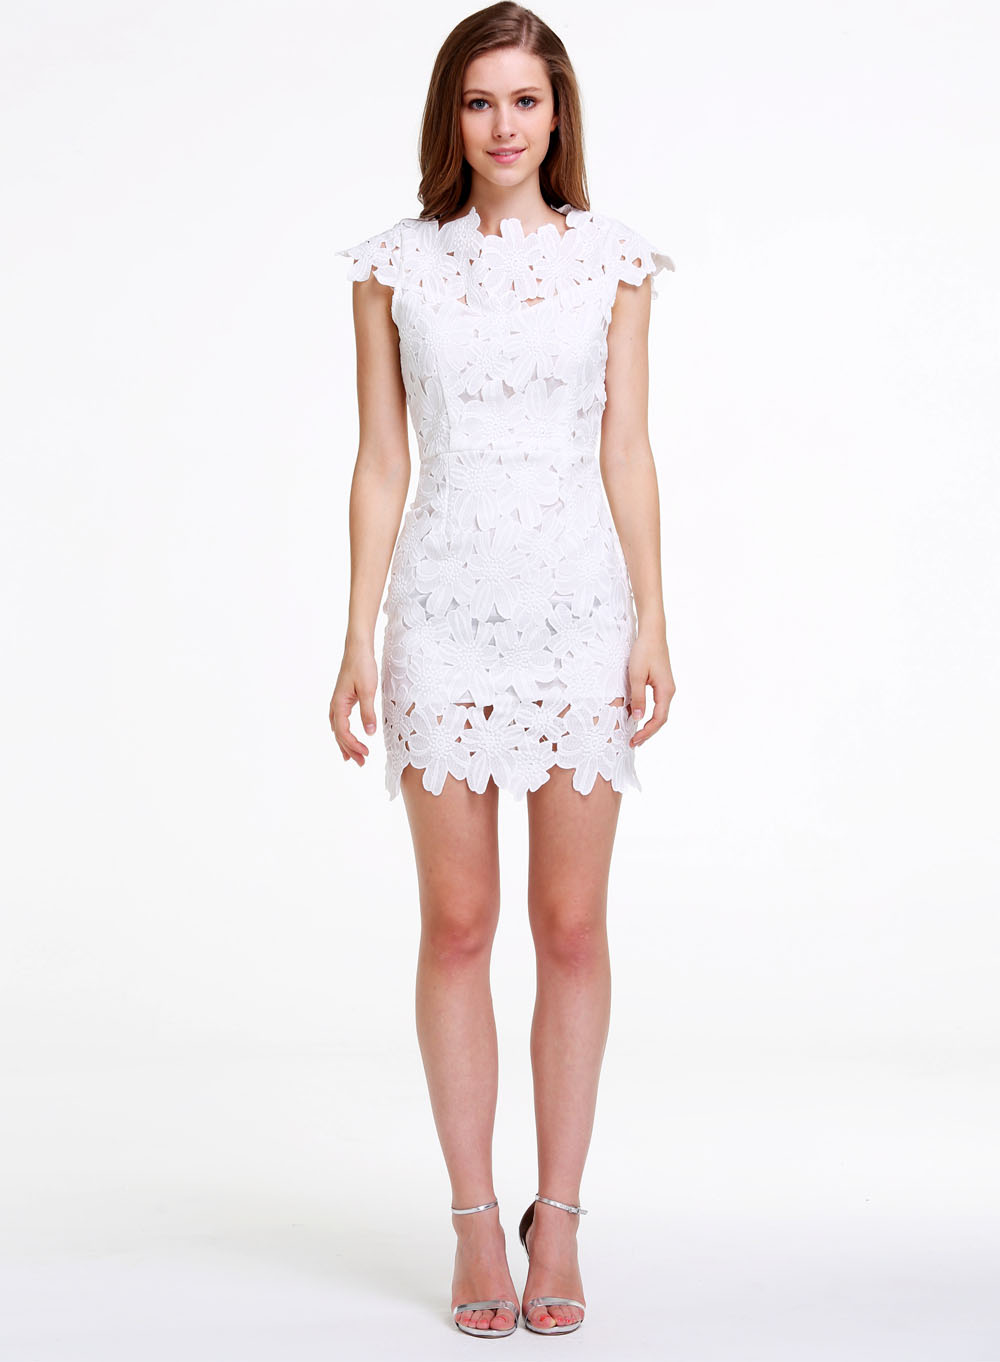 White Short Sleeve Floral Crochet Bodycon Dress - Sheinside.com